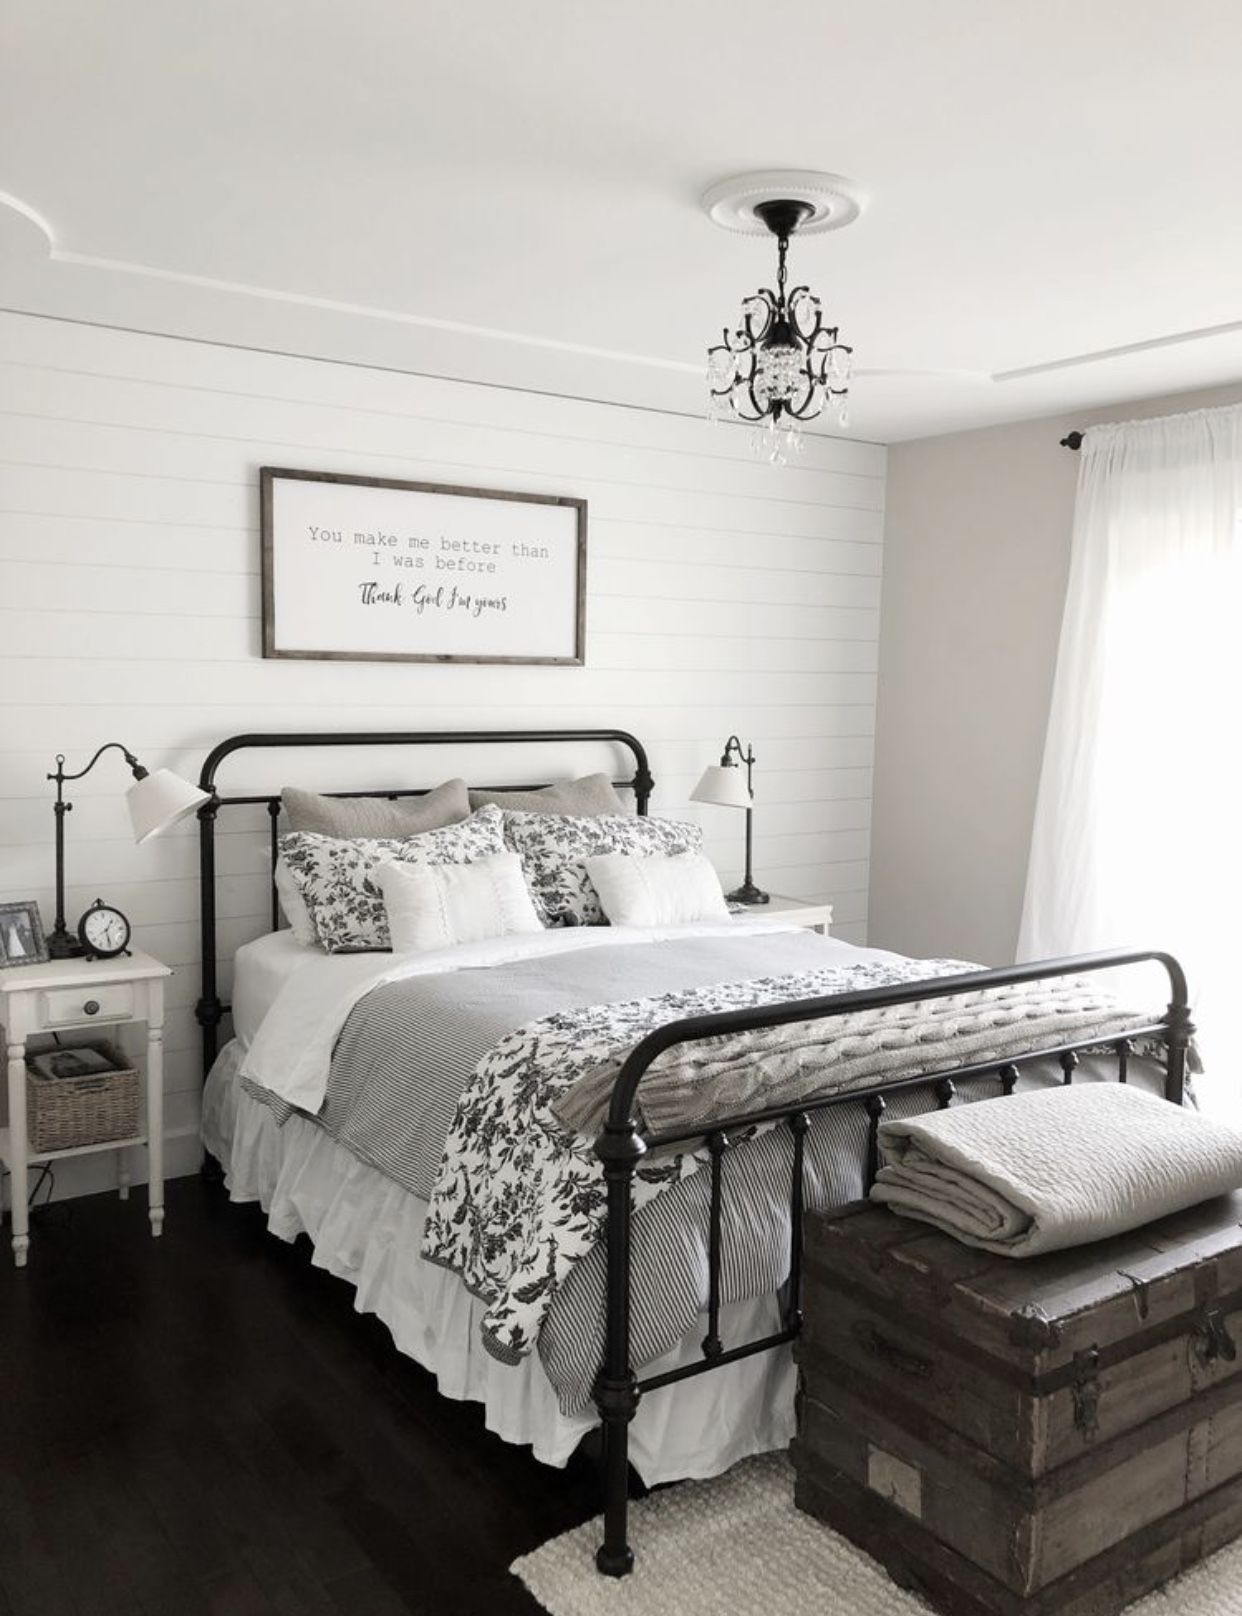 Ticking, floral, gray/black, neutral, cozy Farmhouse